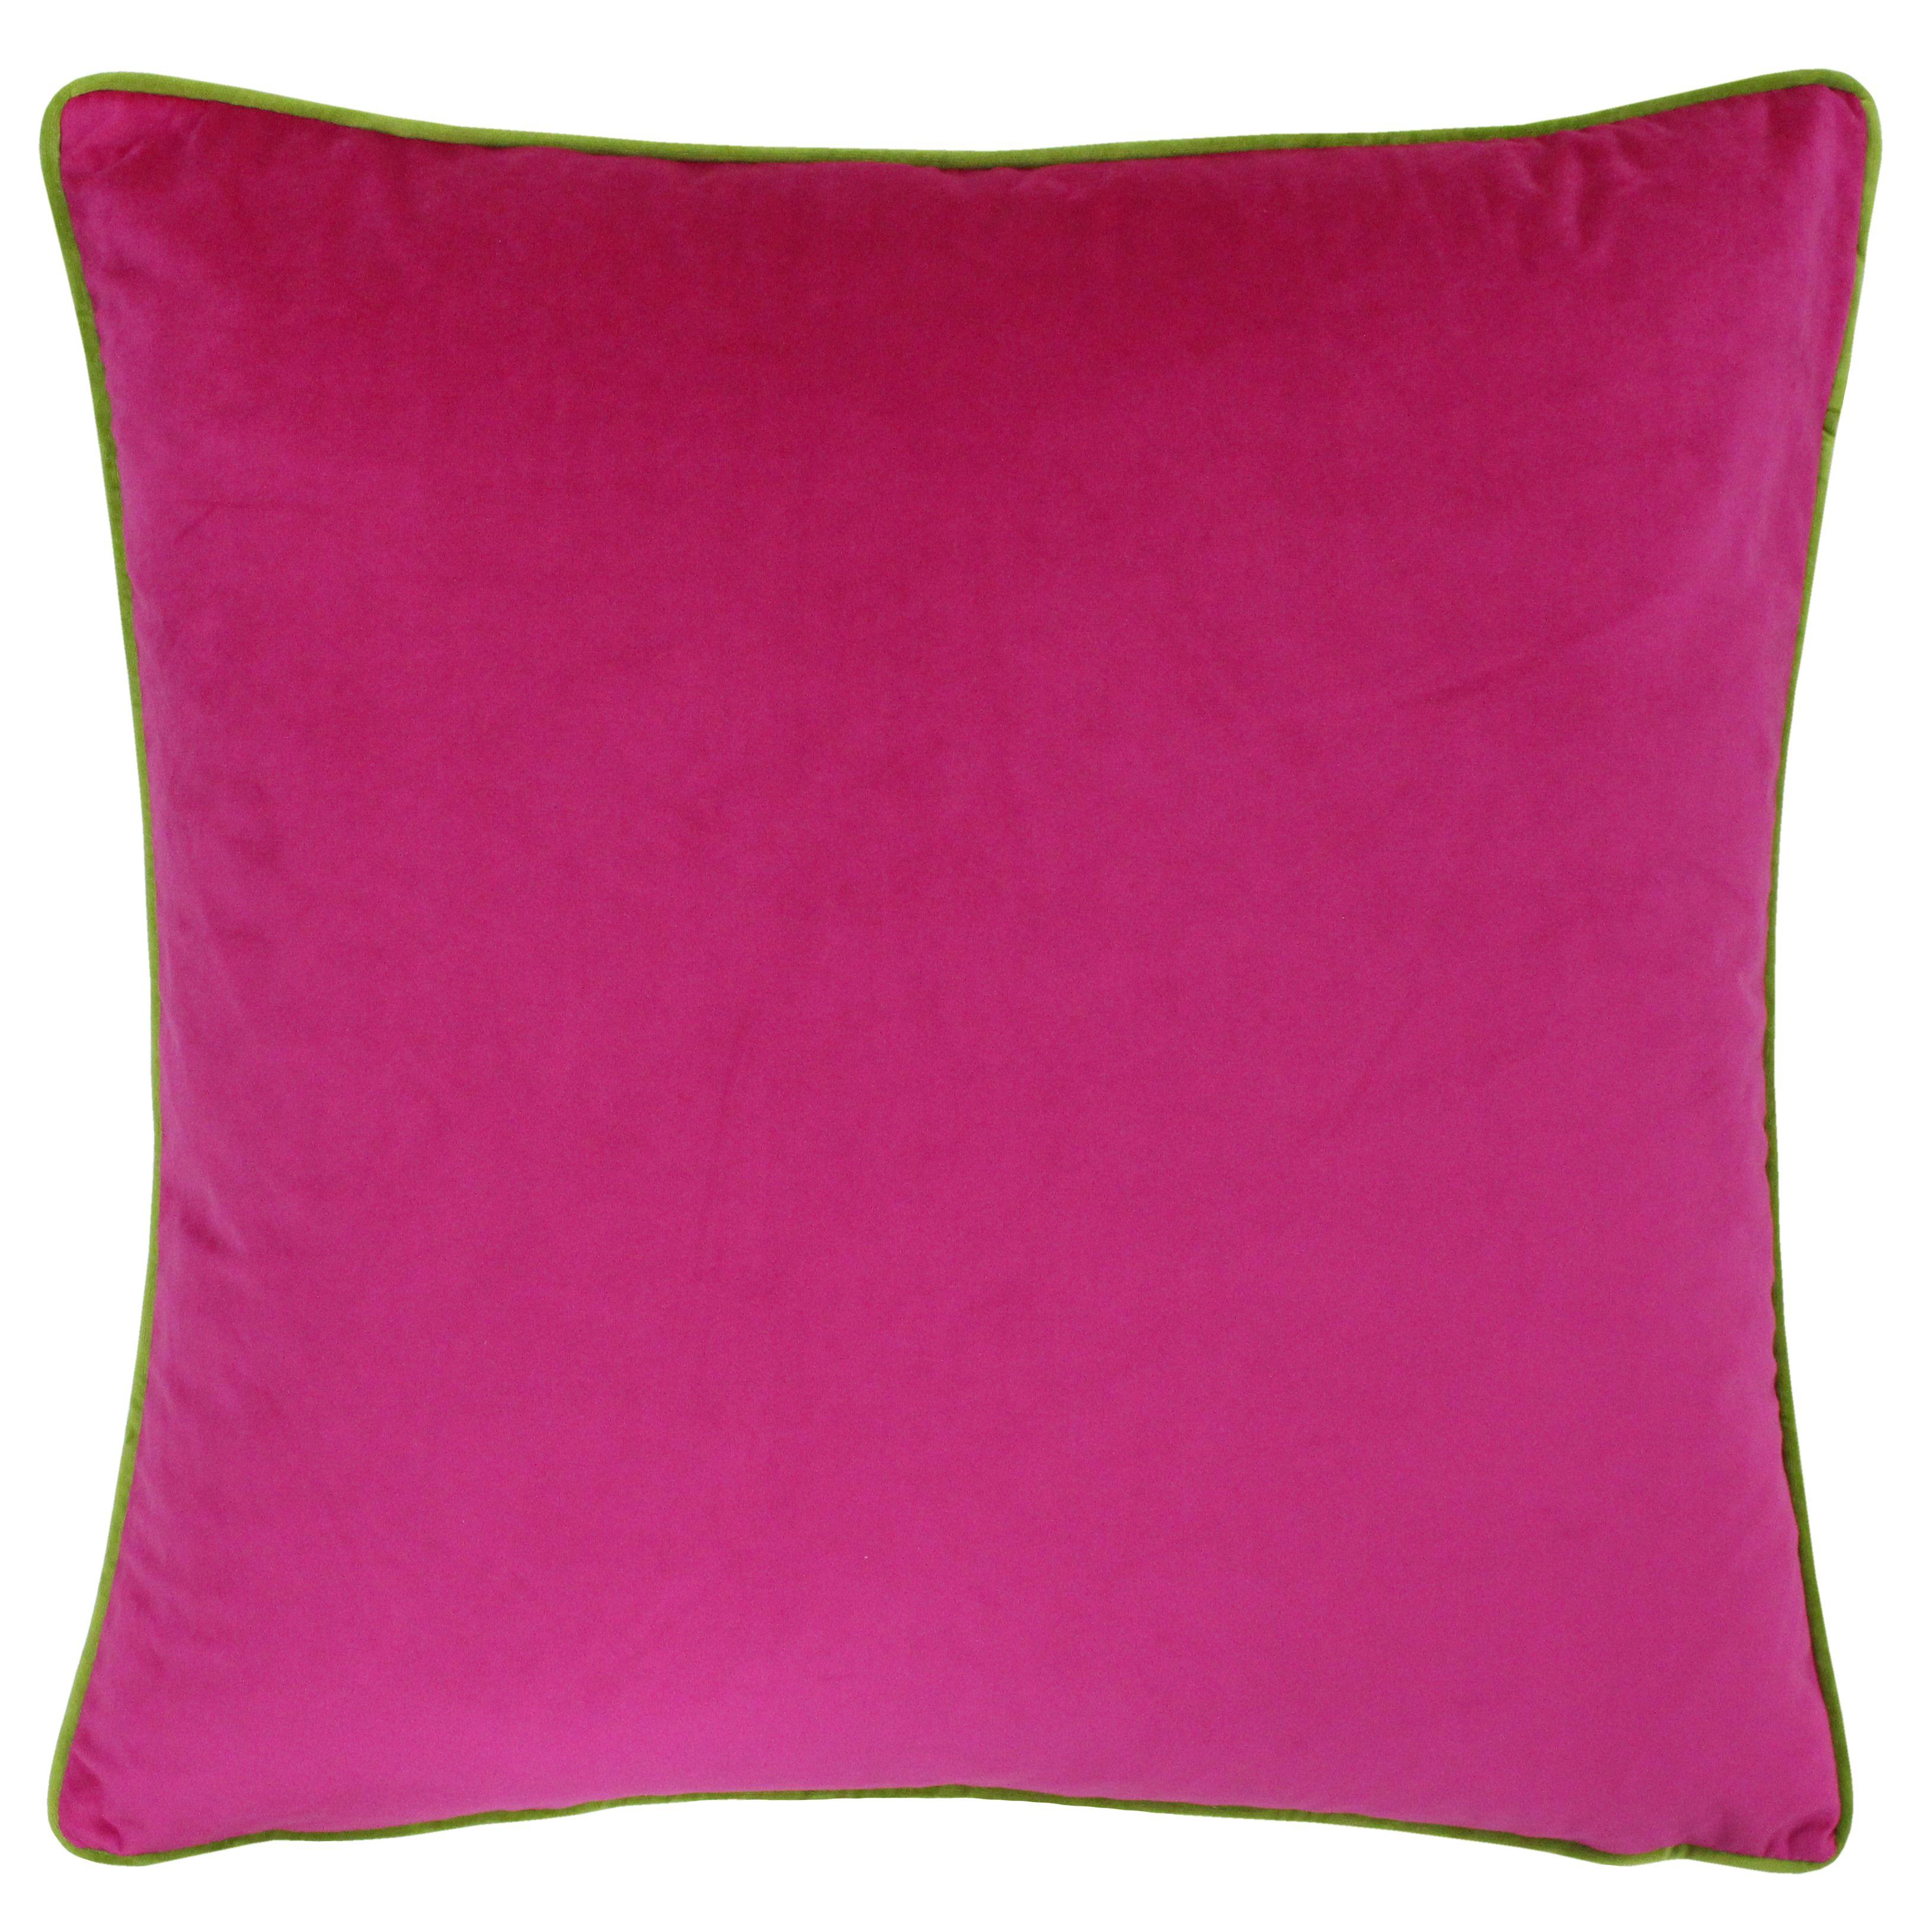 Meridian 55X55 Poly Cushion Hpi/Lim